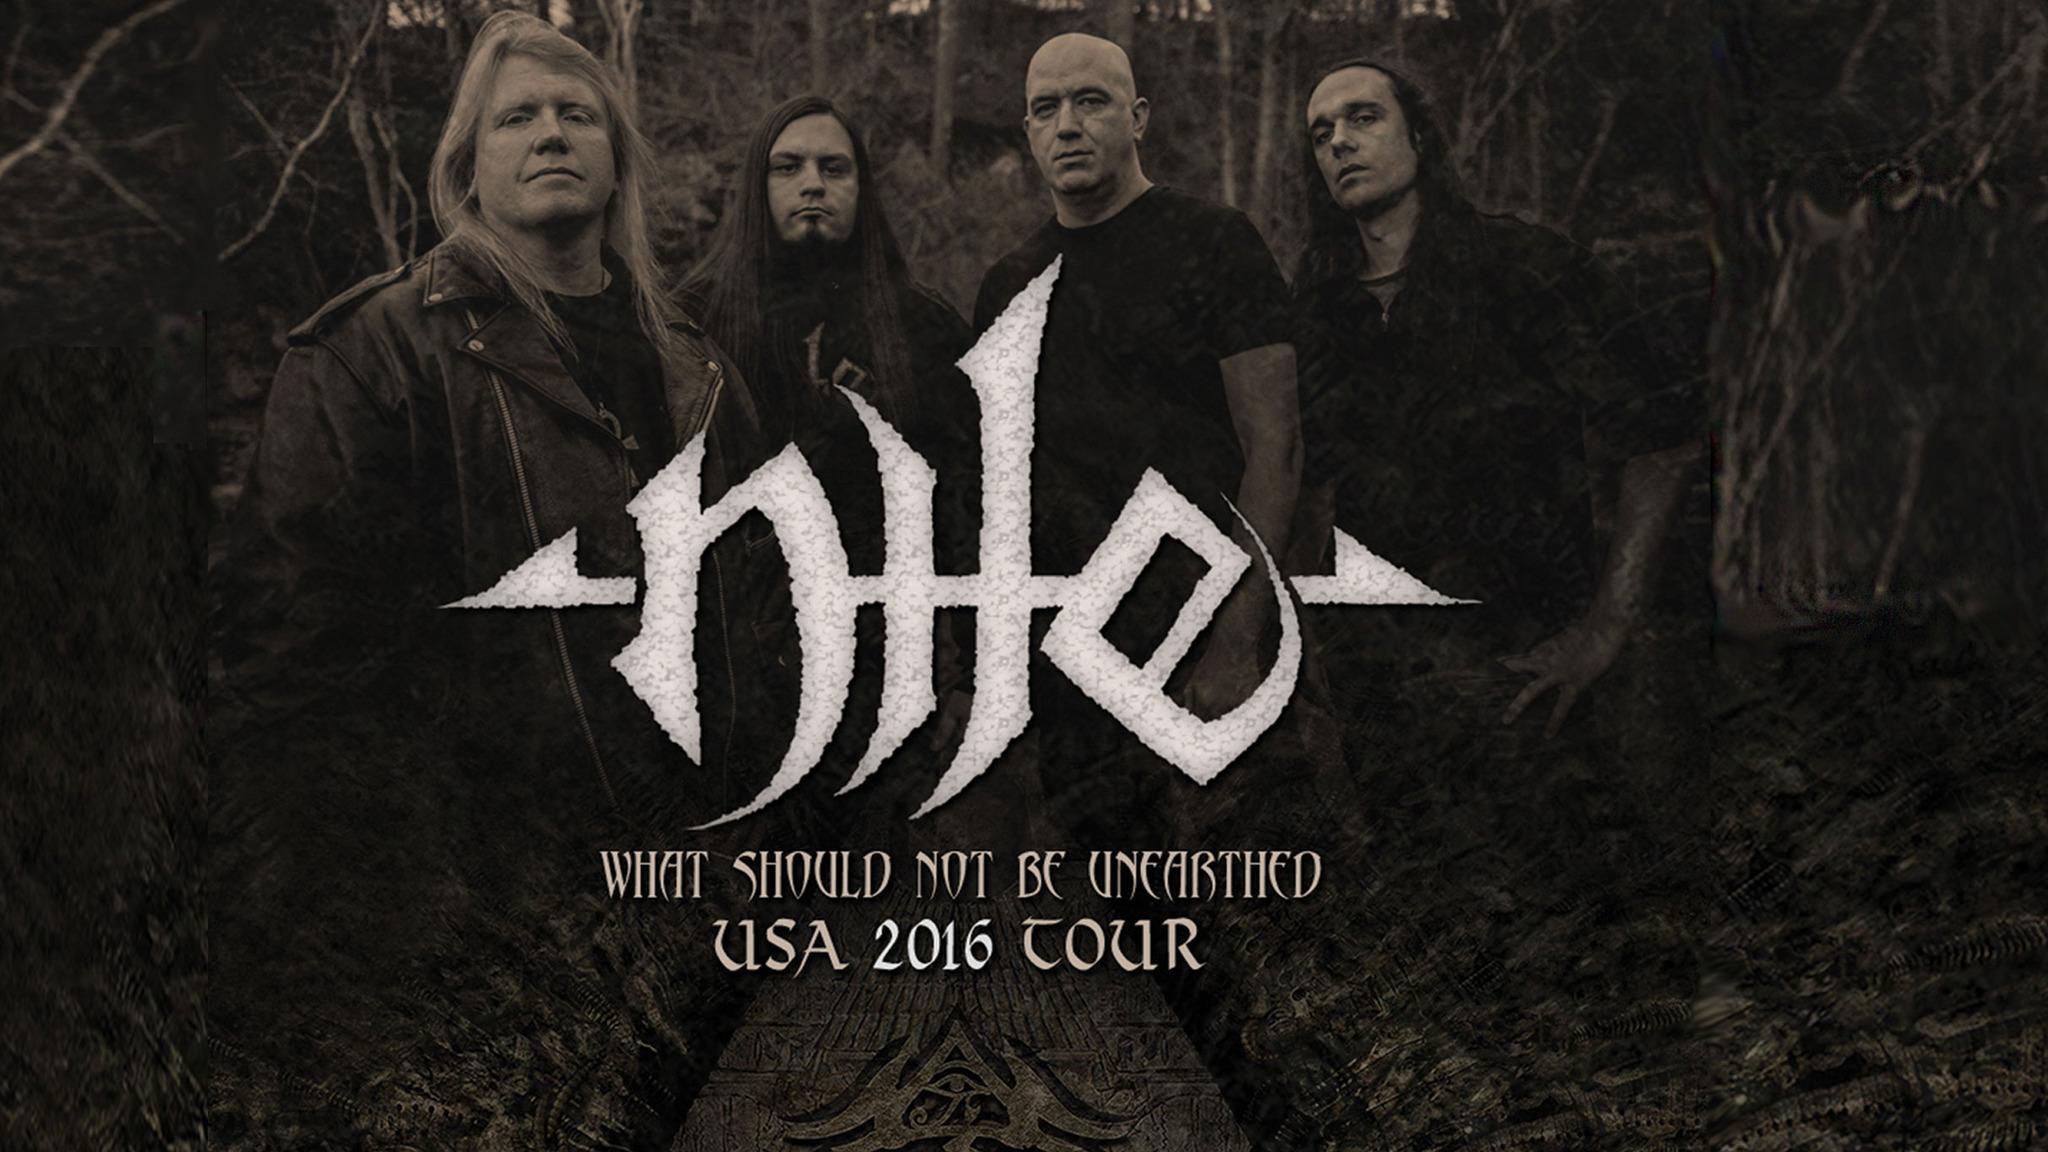 Nile, Soulfly, God Dementia, Orinoco, Beneath the Hollow